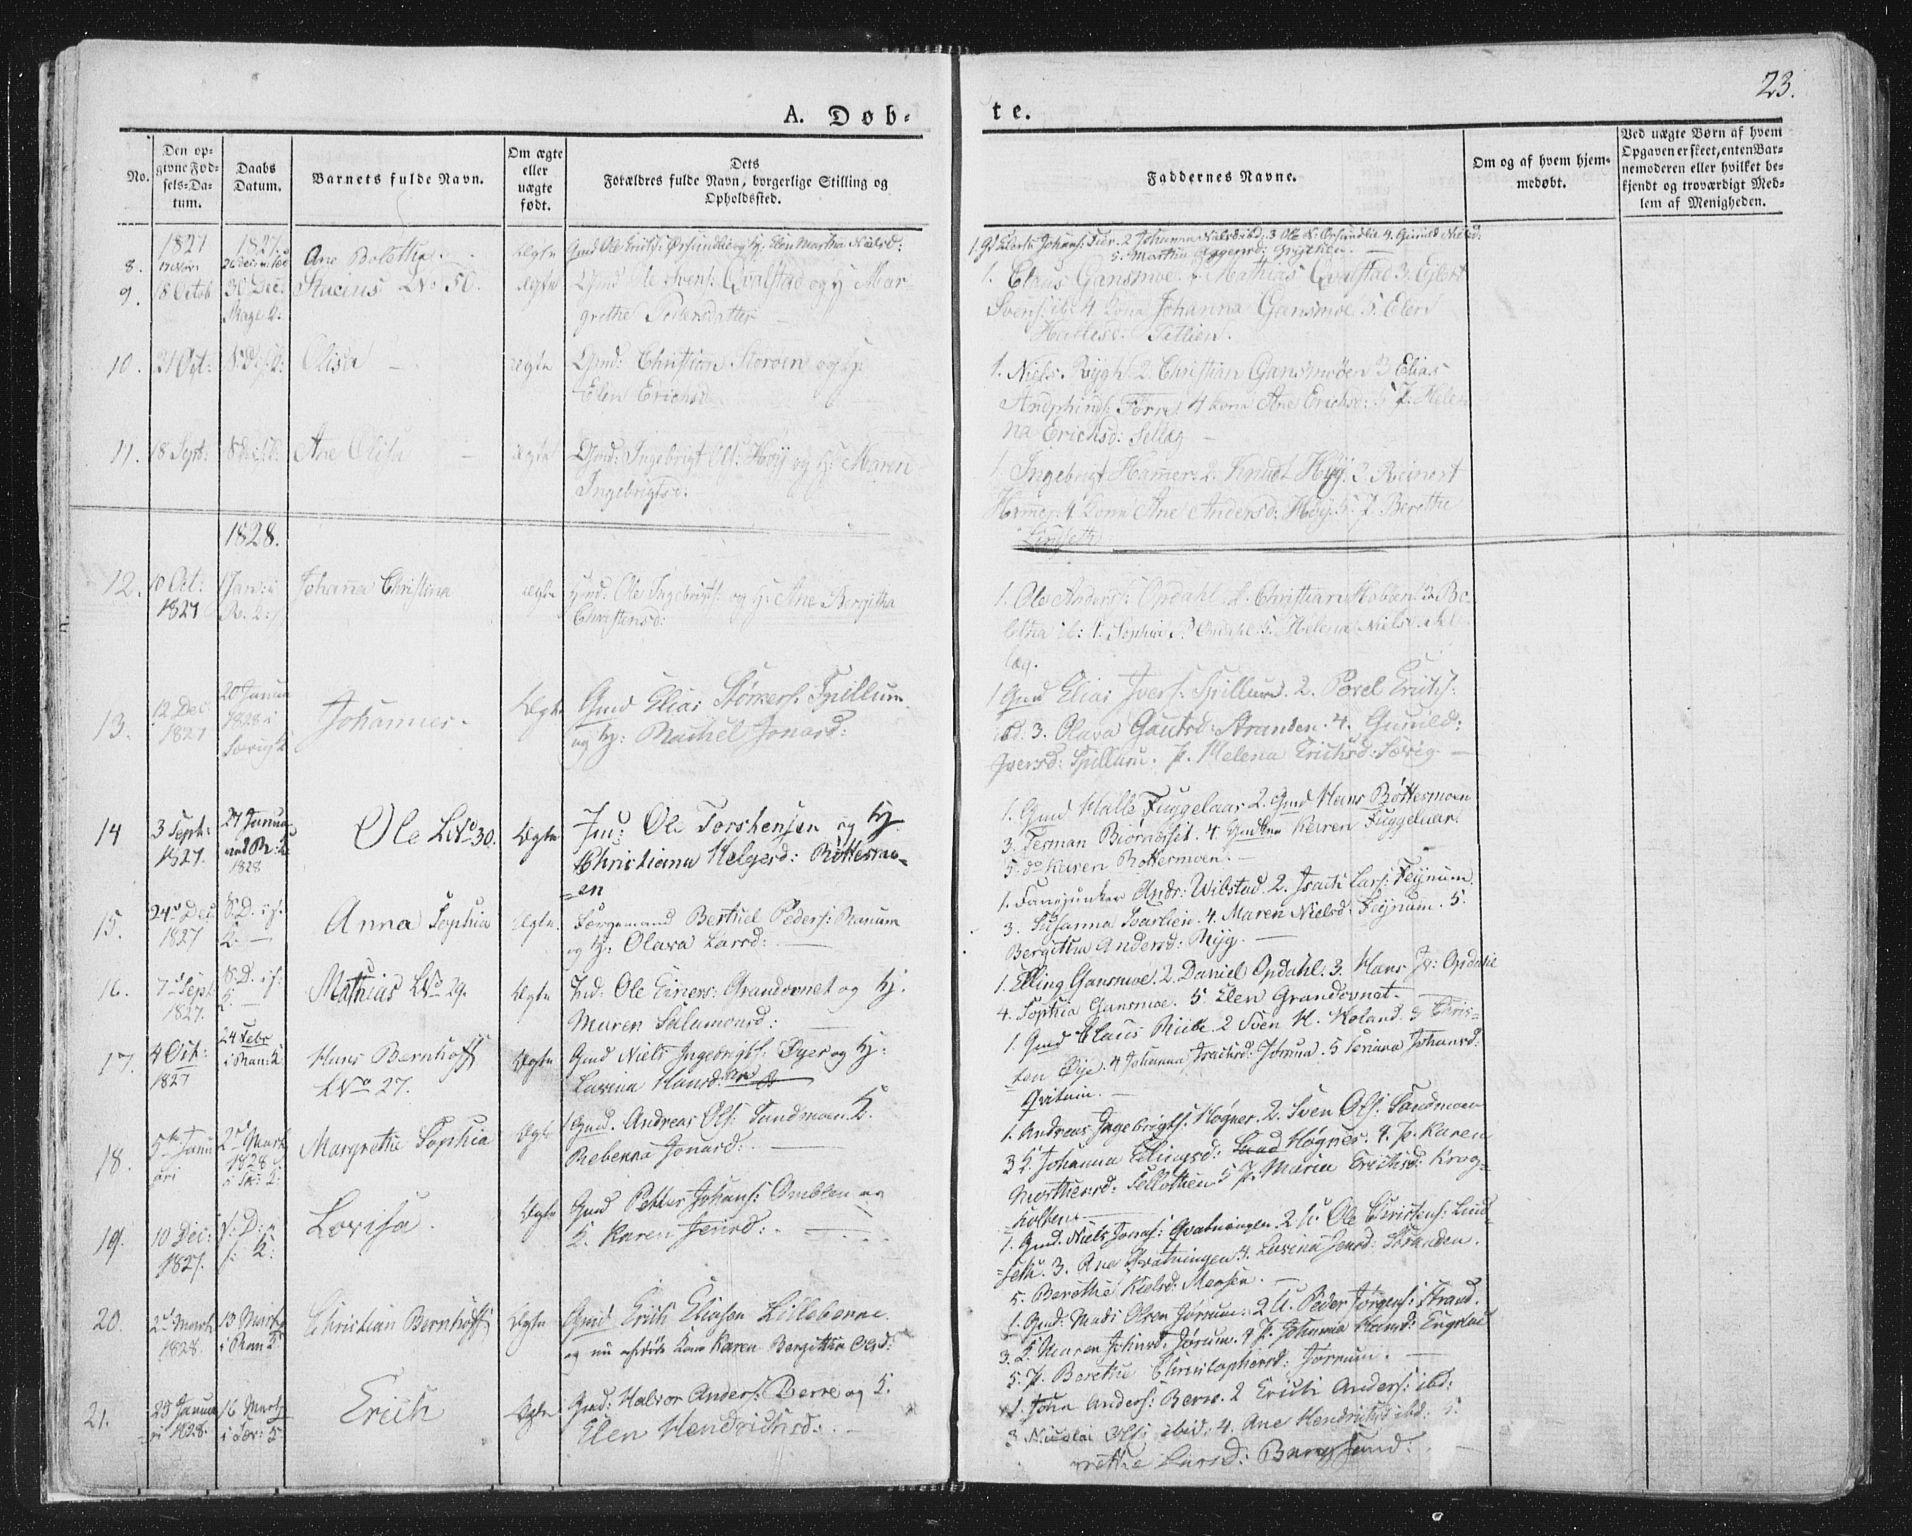 SAT, Ministerialprotokoller, klokkerbøker og fødselsregistre - Nord-Trøndelag, 764/L0551: Ministerialbok nr. 764A07a, 1824-1864, s. 23